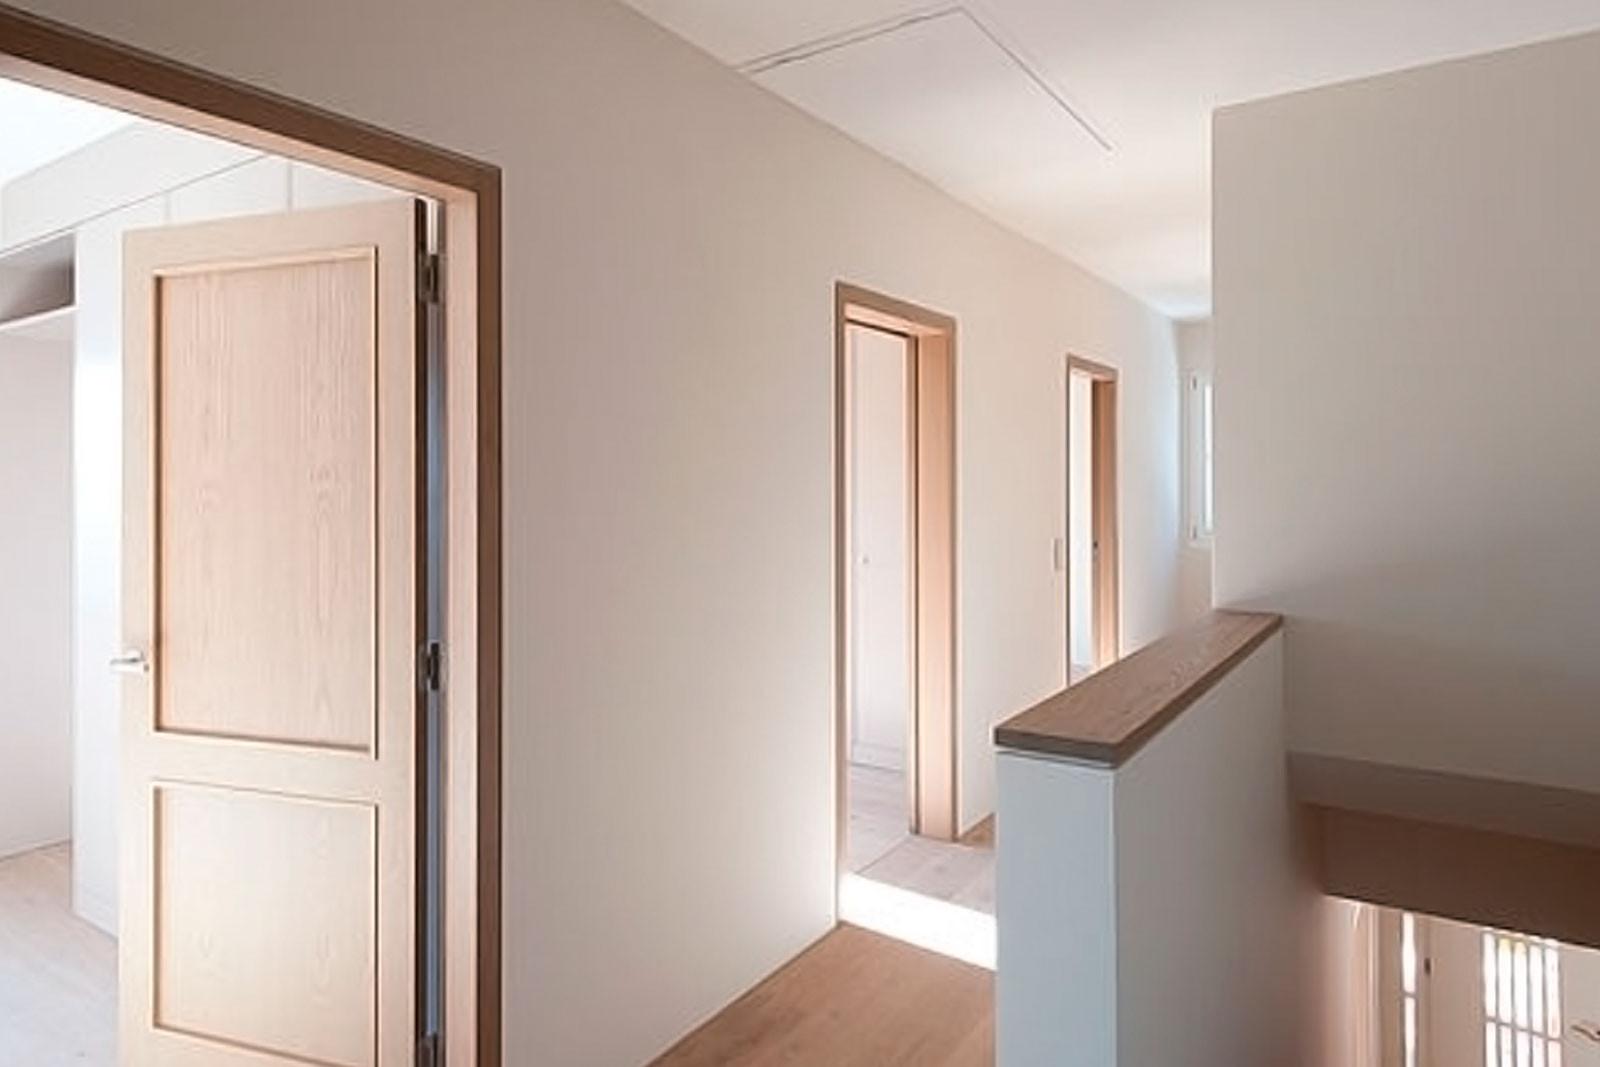 Single-family home in Muri bei Bern, Campanile Michetti AG SwissSkills Bern 2014, Savoir Social, Stefan Zwicky, Architect, Zurich